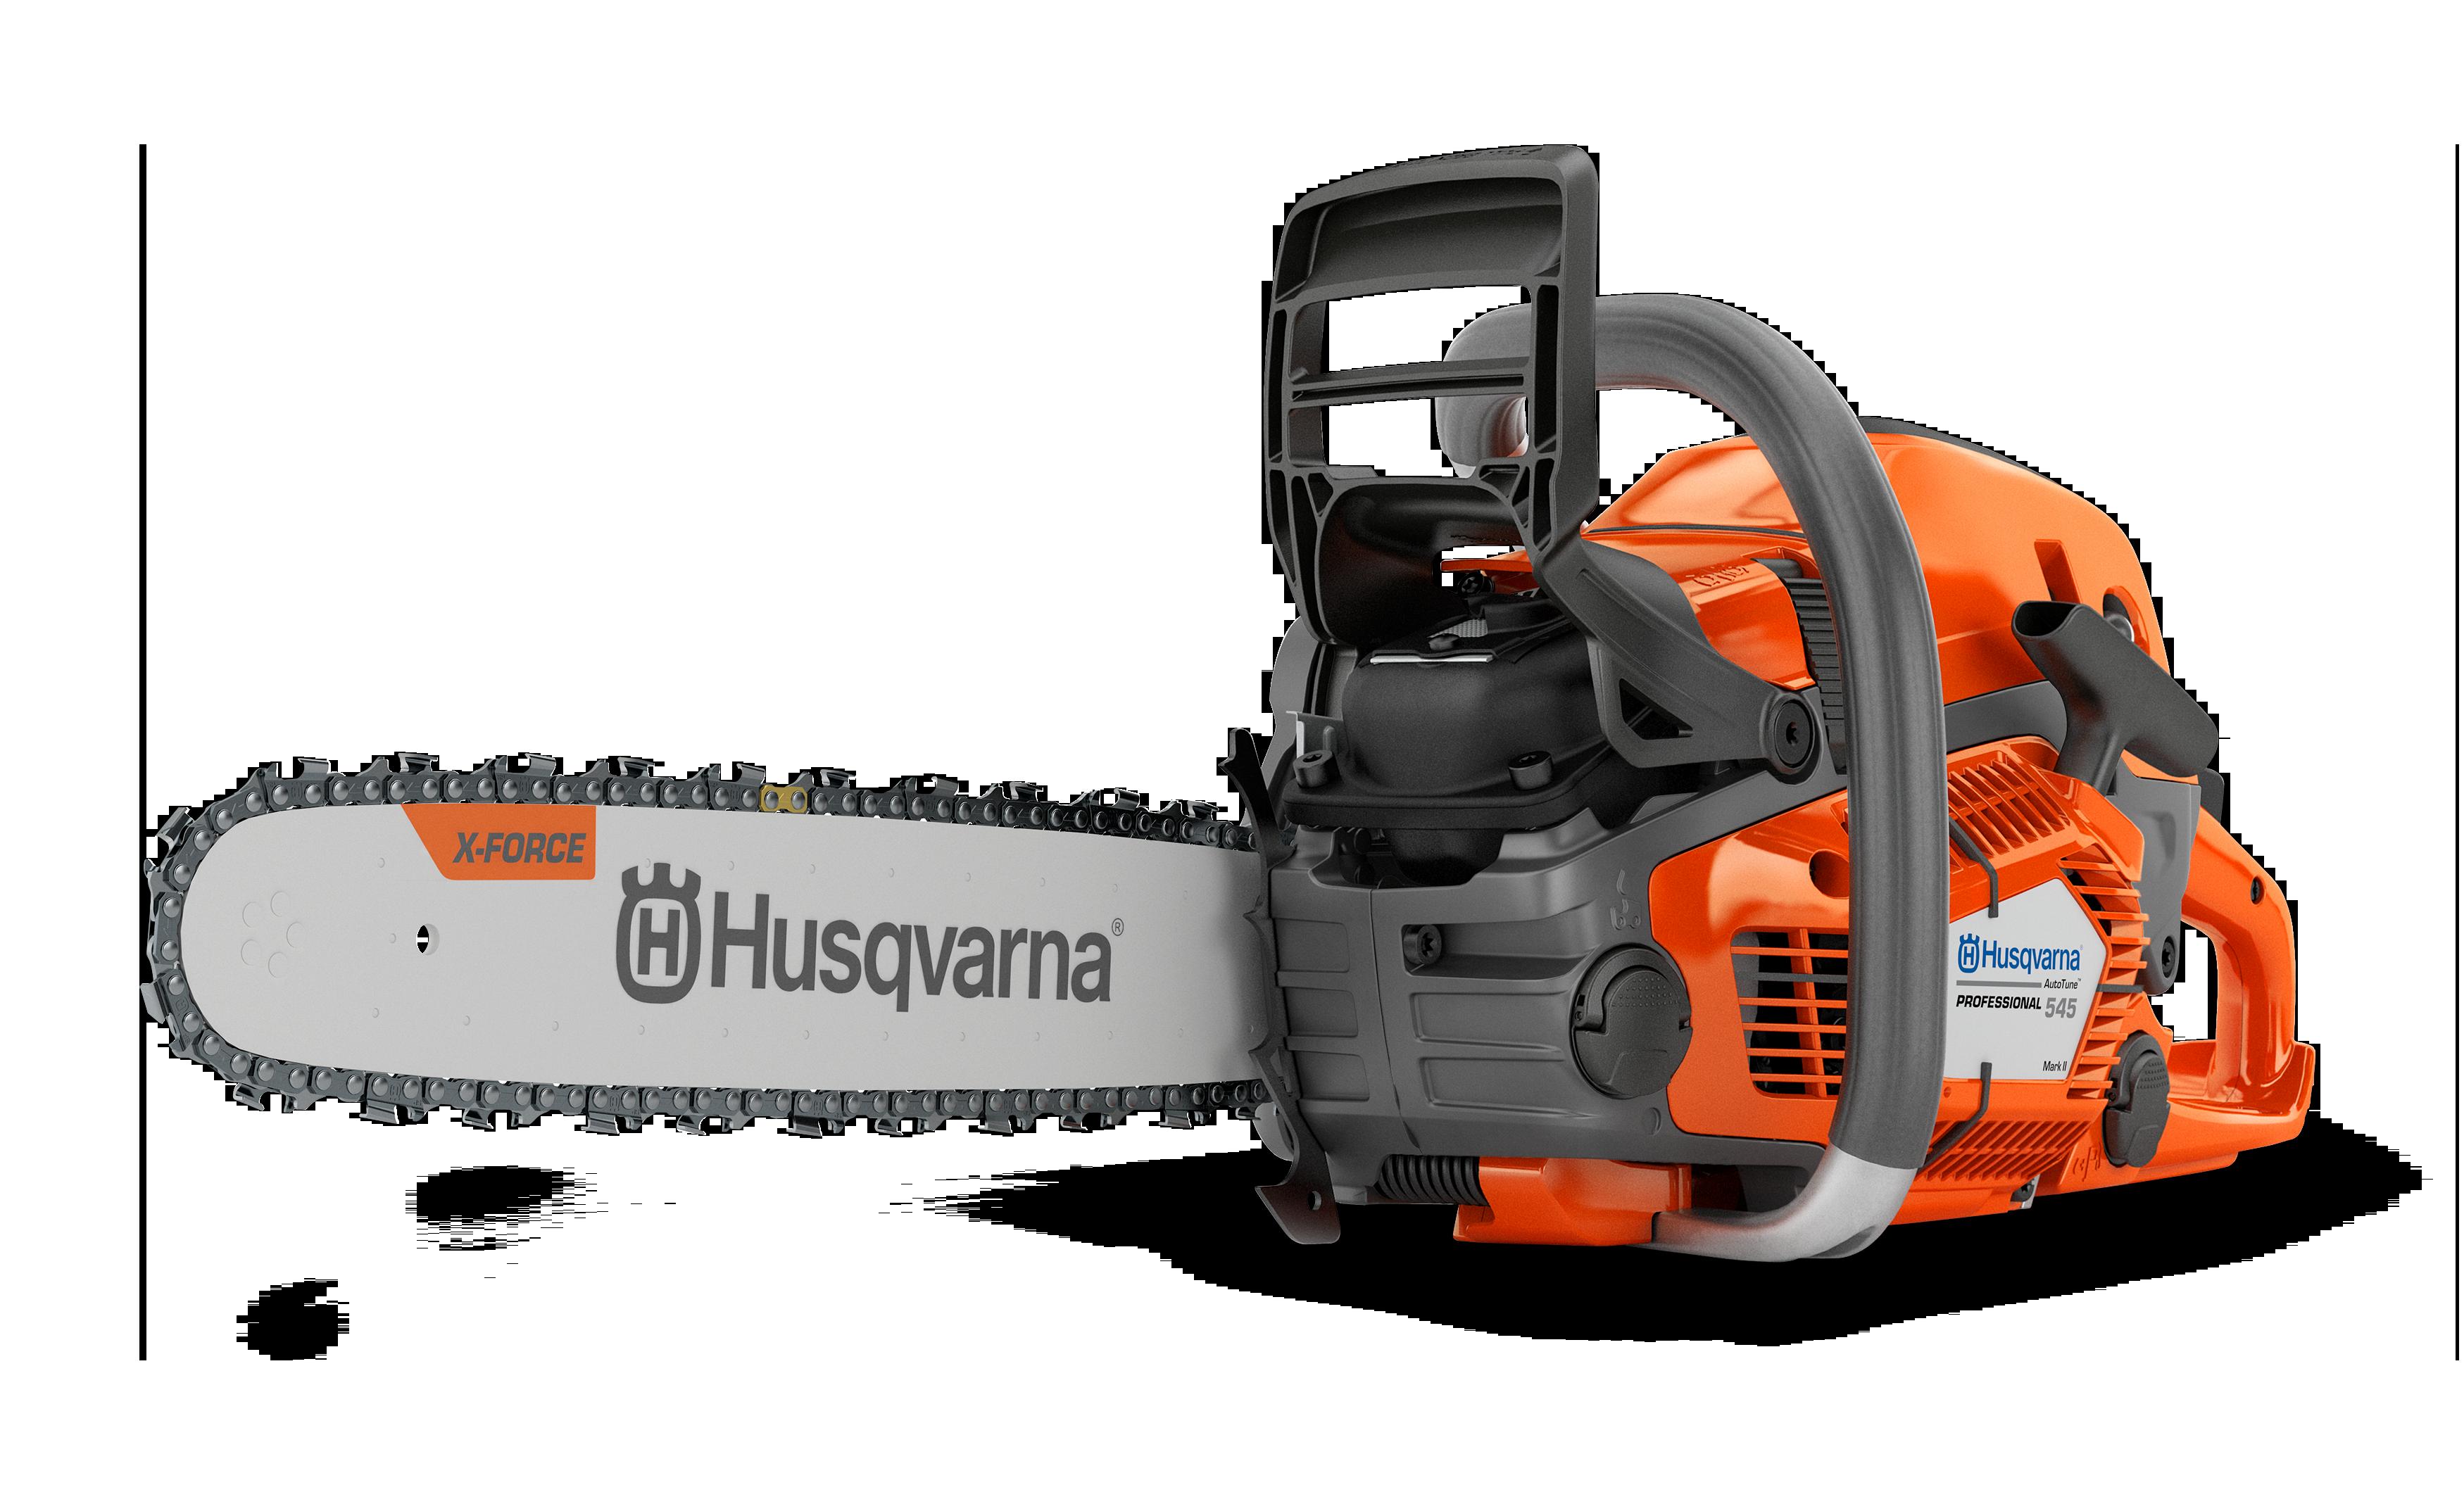 Husqvarna-545MarkII